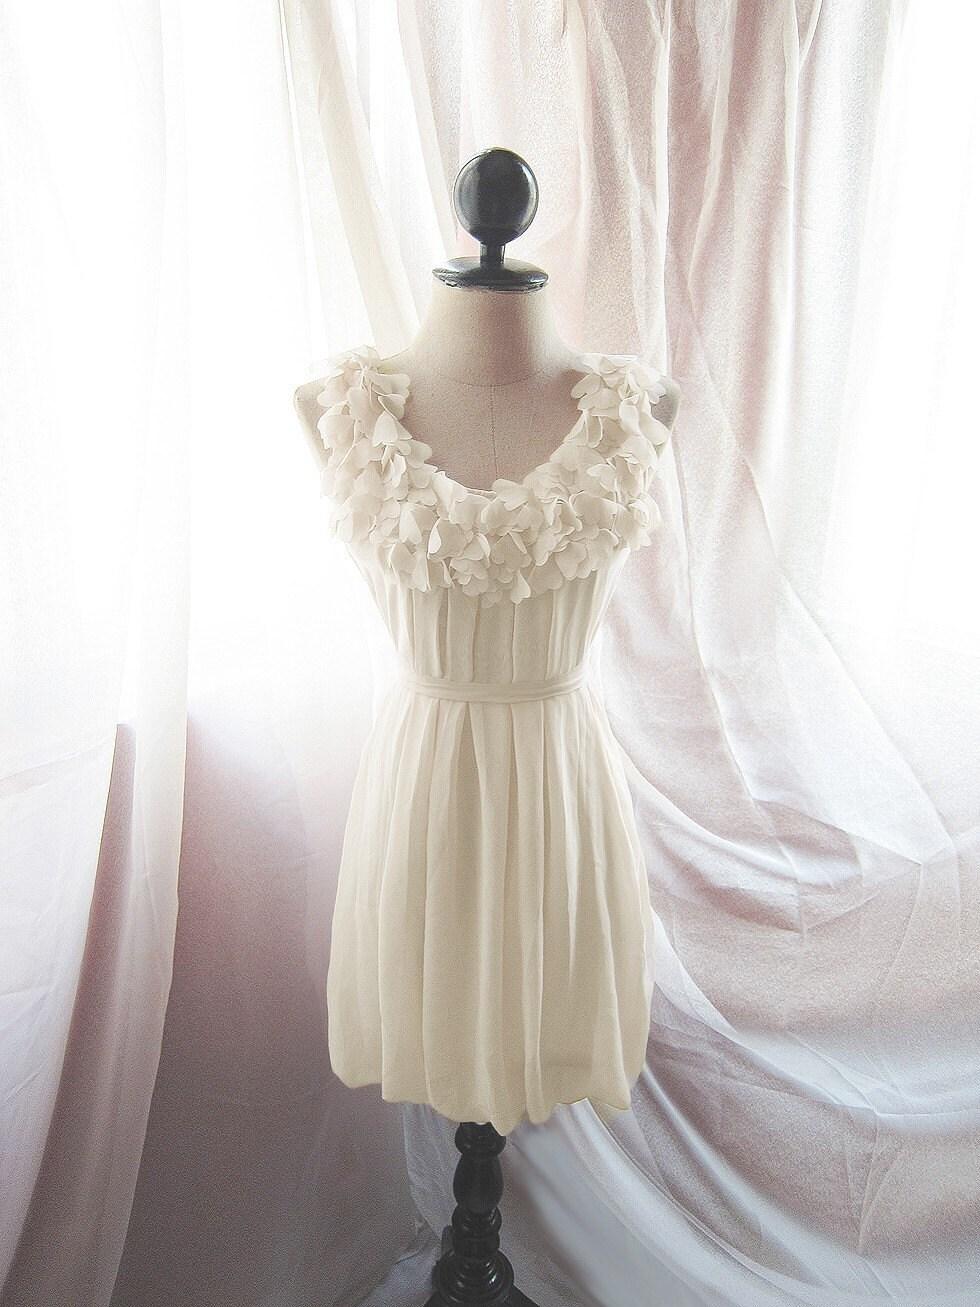 Romantic Creamy Pale Petal Cream Havisham Winter Snow Heart Cutouts Flirty Fun Doll Chiffon Flowy Dress